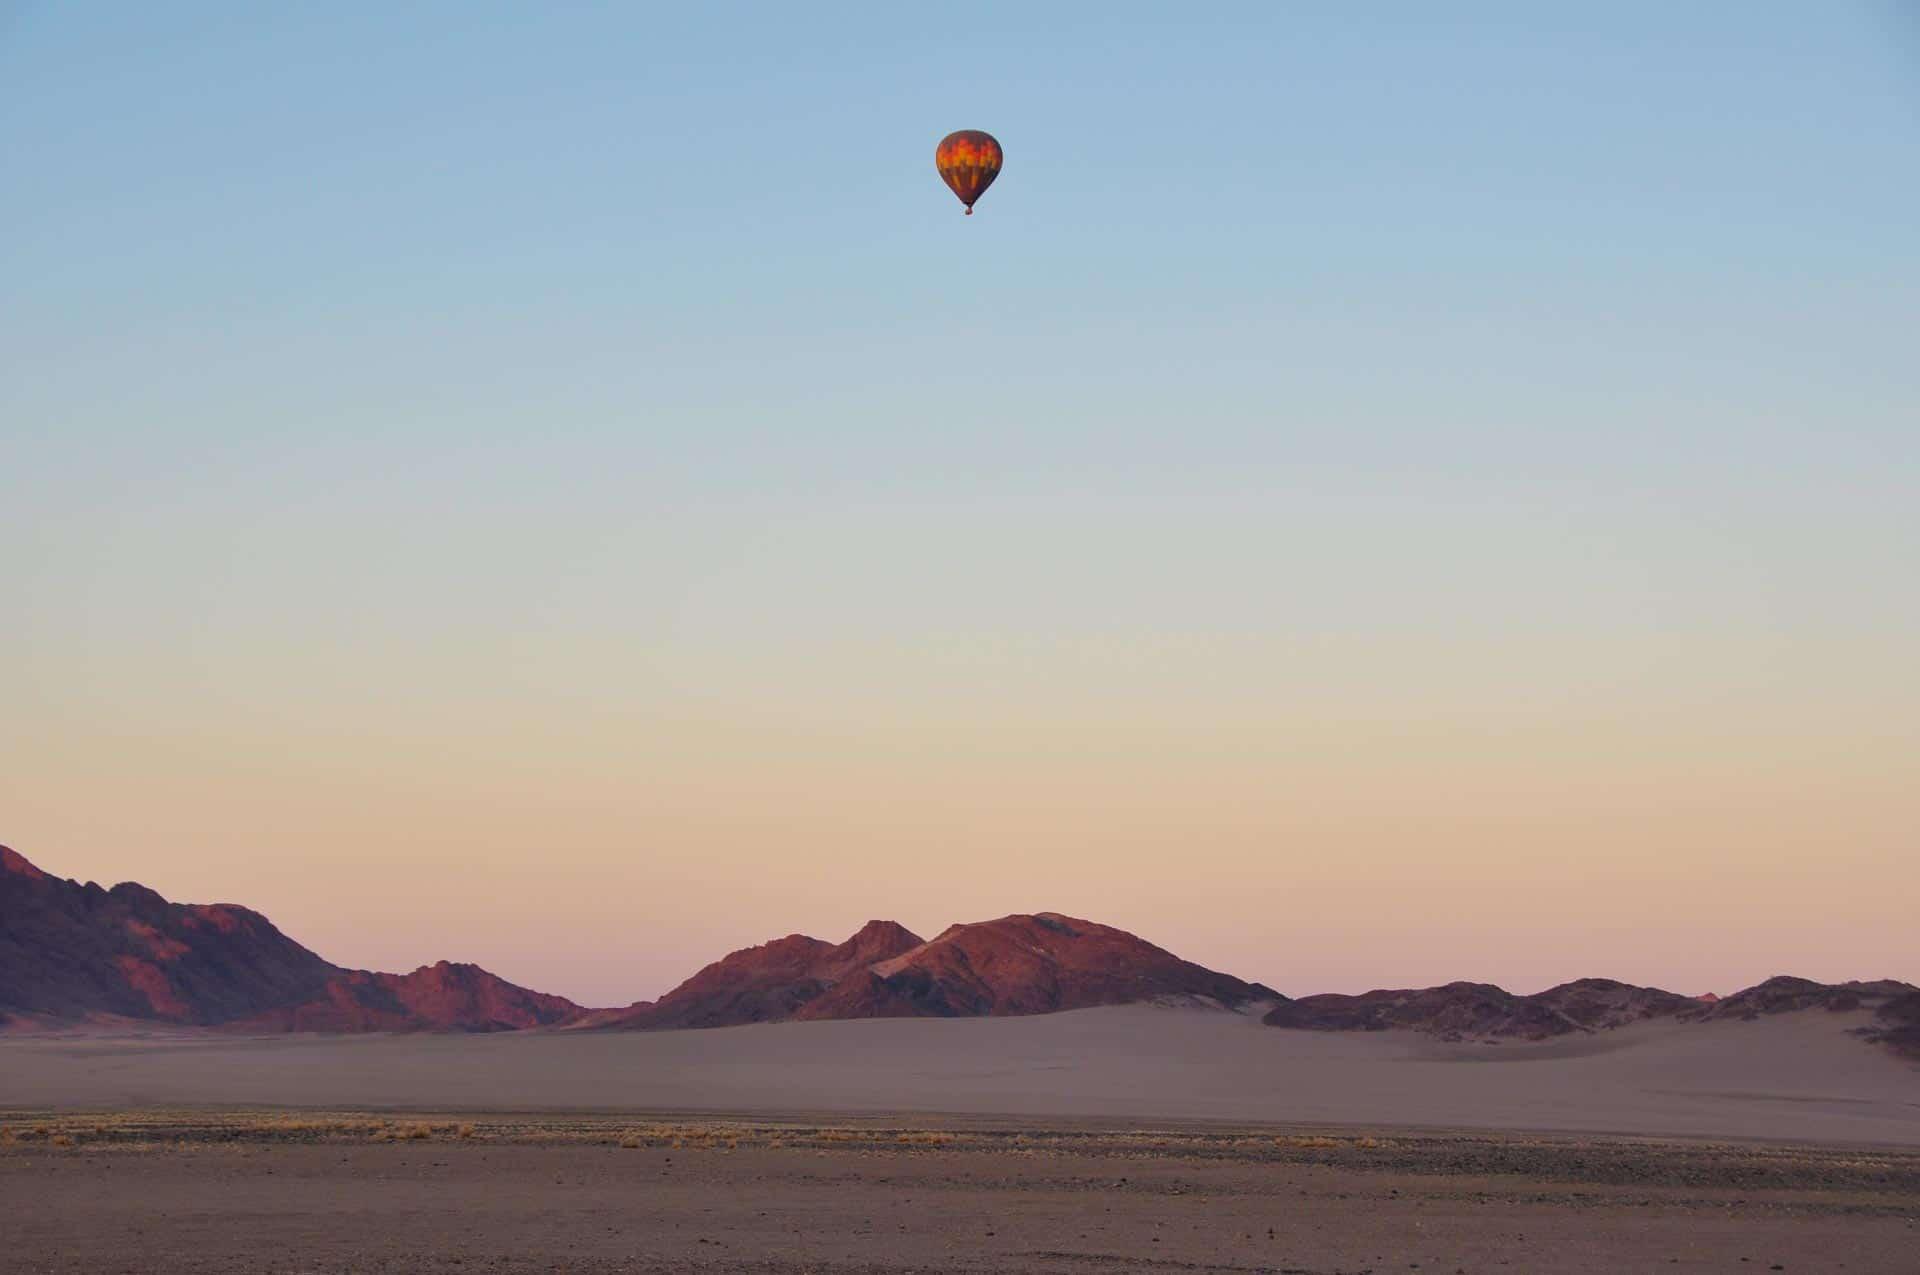 Namib-Ballonfahrt-Wueste-Namibia-Globetrotter-Select-10